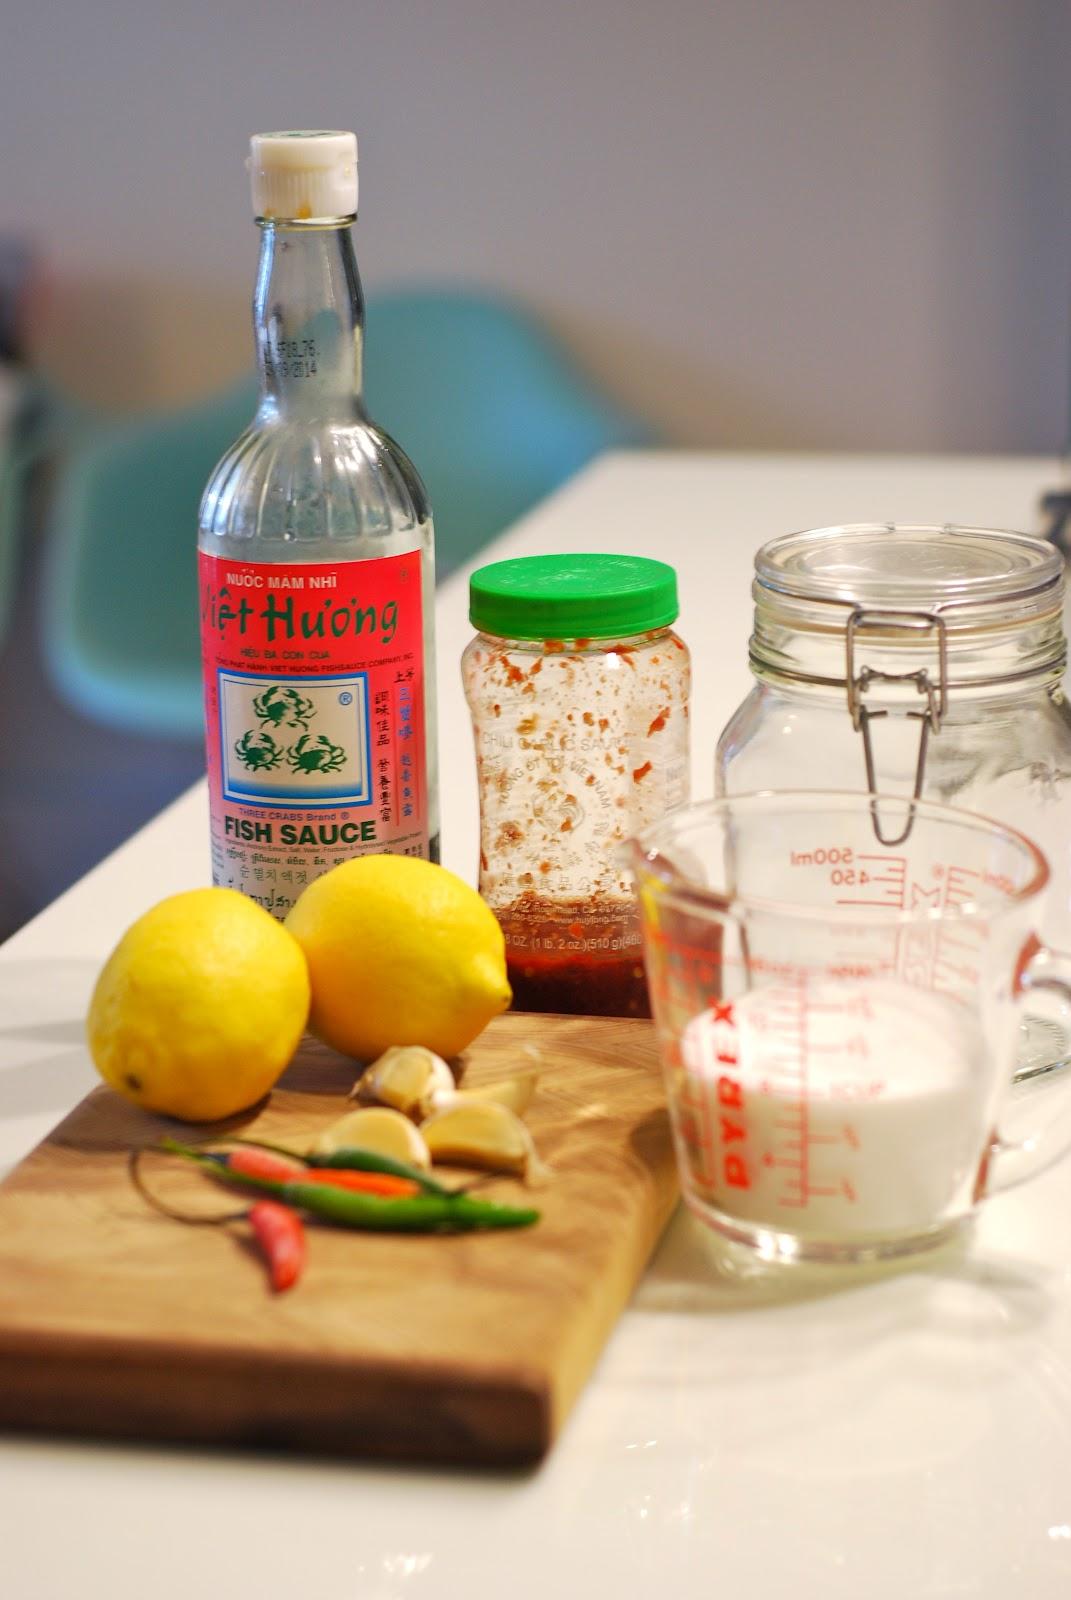 N c m m mixed fish sauce haonoah for Fish sauce ingredients